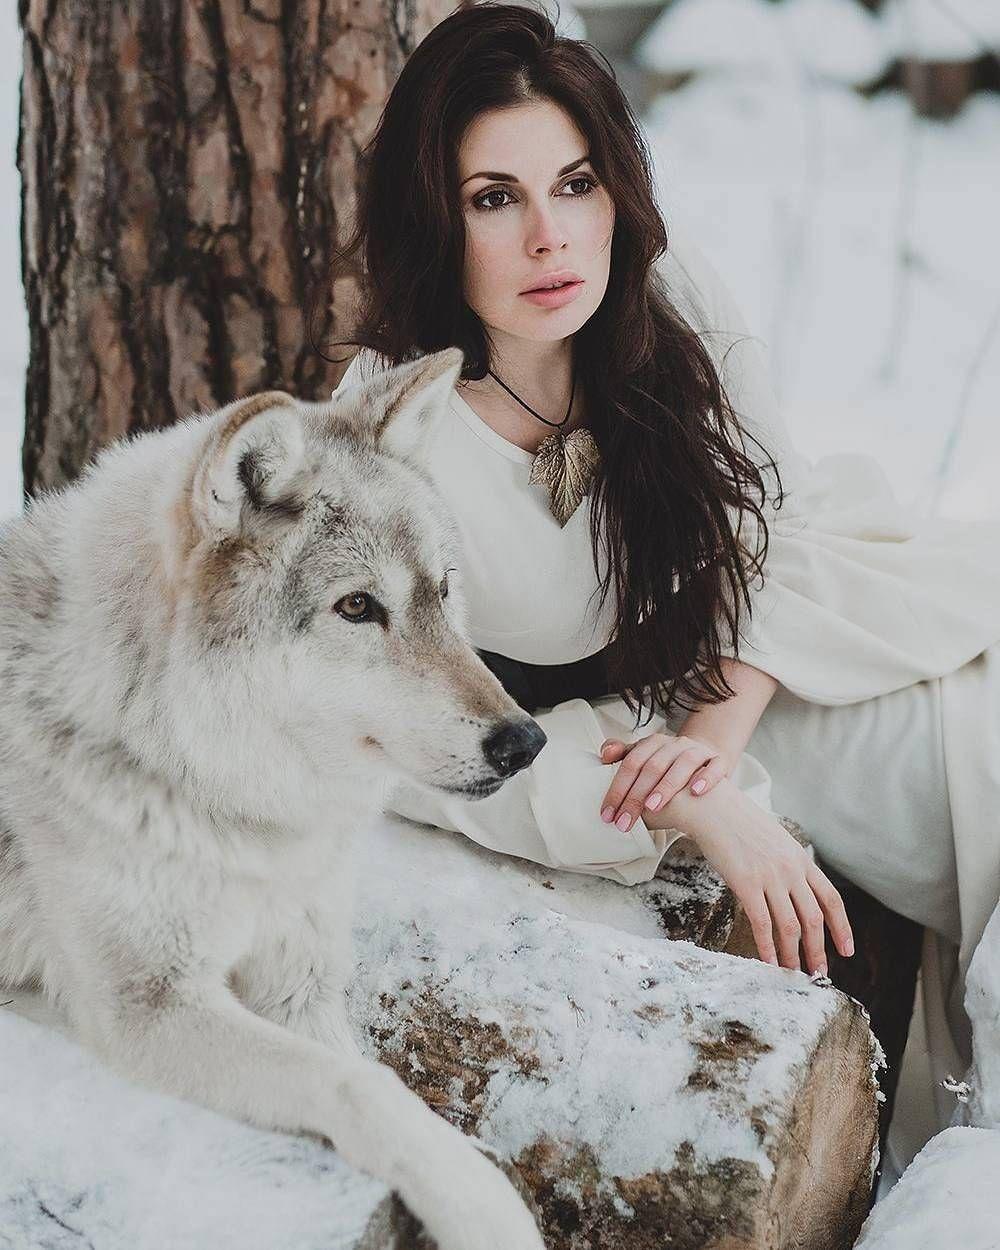 People And Animals Photos Of Olga Barantseva Httpphotovidecom - Photographer captures fairytale like portraits women animals